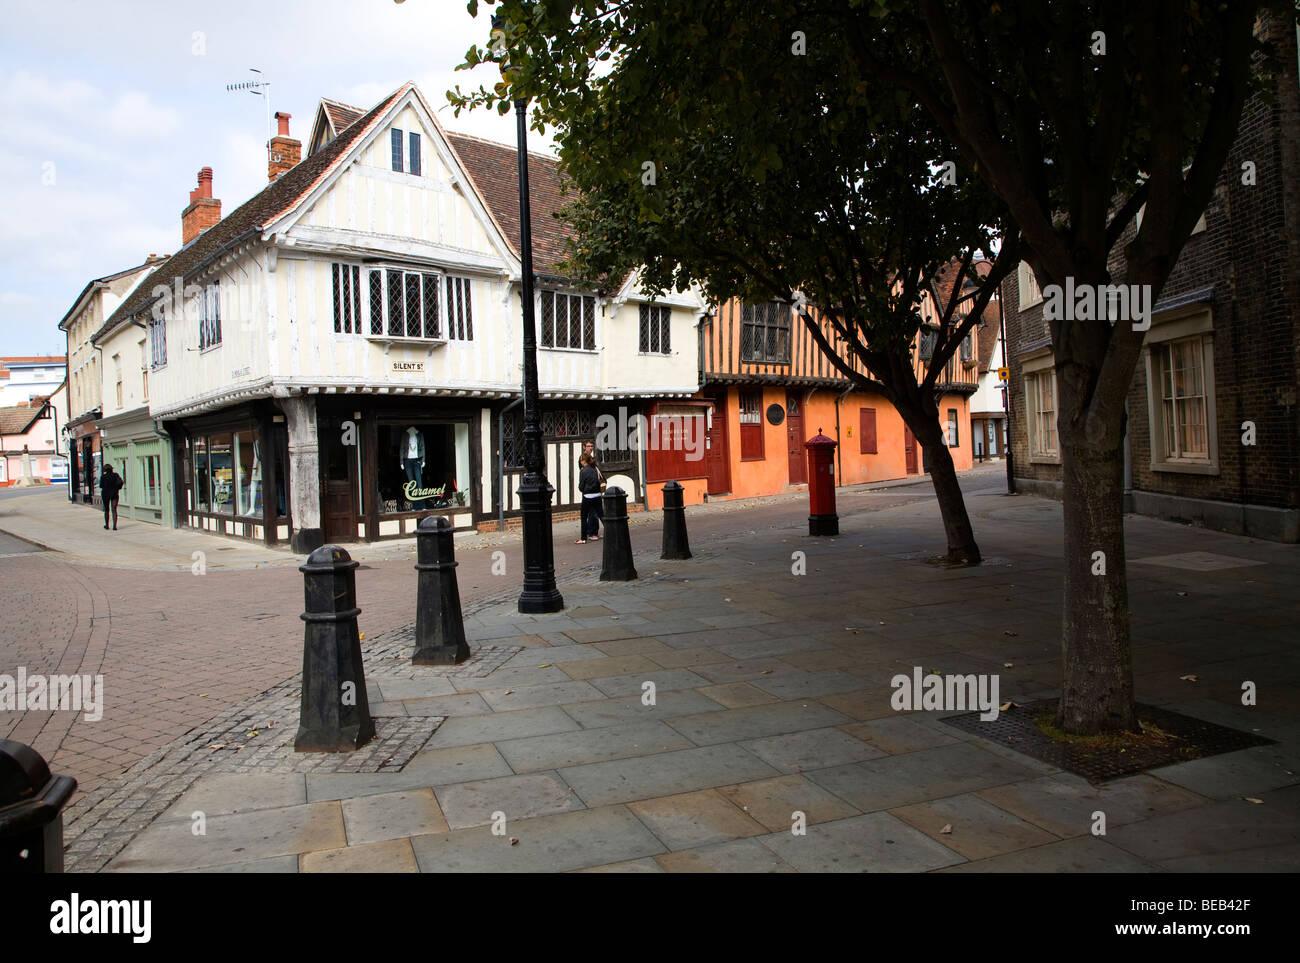 Edifici in stile Tudor, Silent Street, Ipswich, Immagini Stock